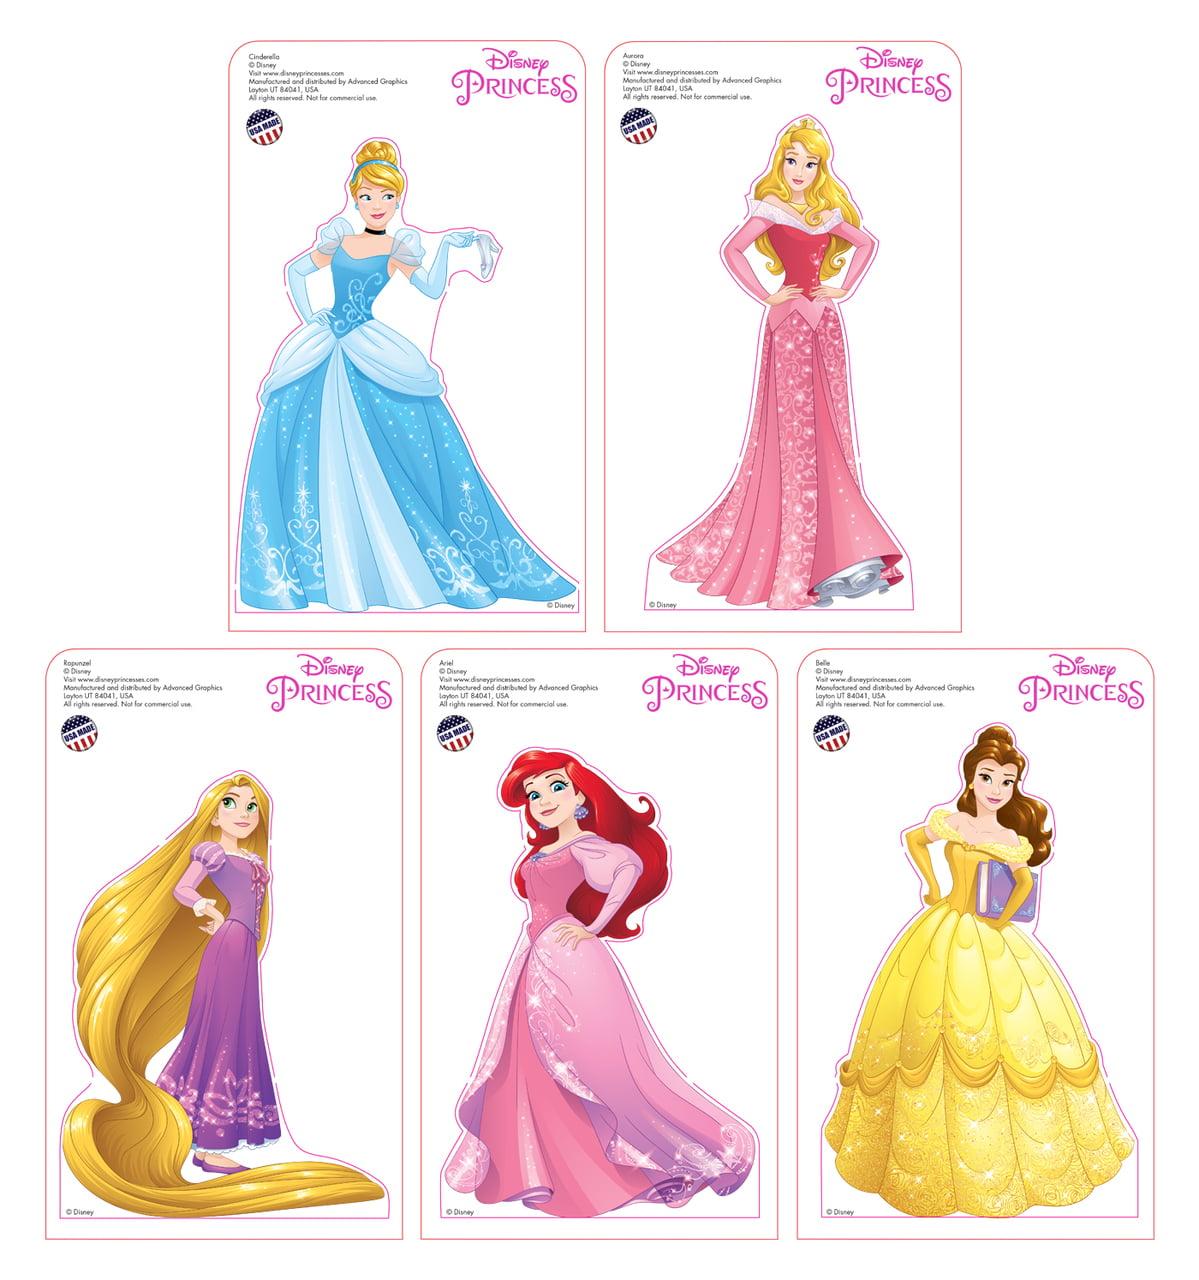 Mini Disney Princesses Standees 2016 (5 pack: Belle, Rapunzel, Cinderella, Aurora and Ariel)